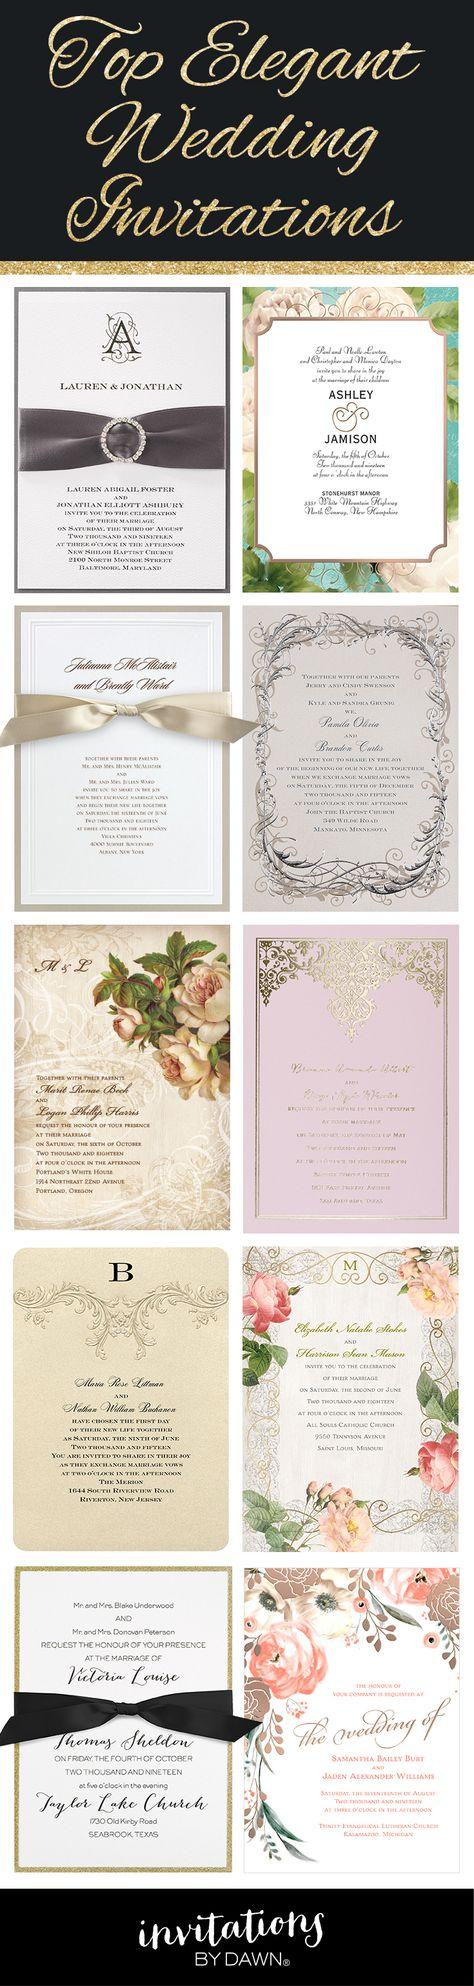 wedding invitation wording start time%0A fairy tale wedding invitation wording from www invitationsbydawn com    Disney Wedding   Pinterest   Invitation wording  Fairy and Weddings